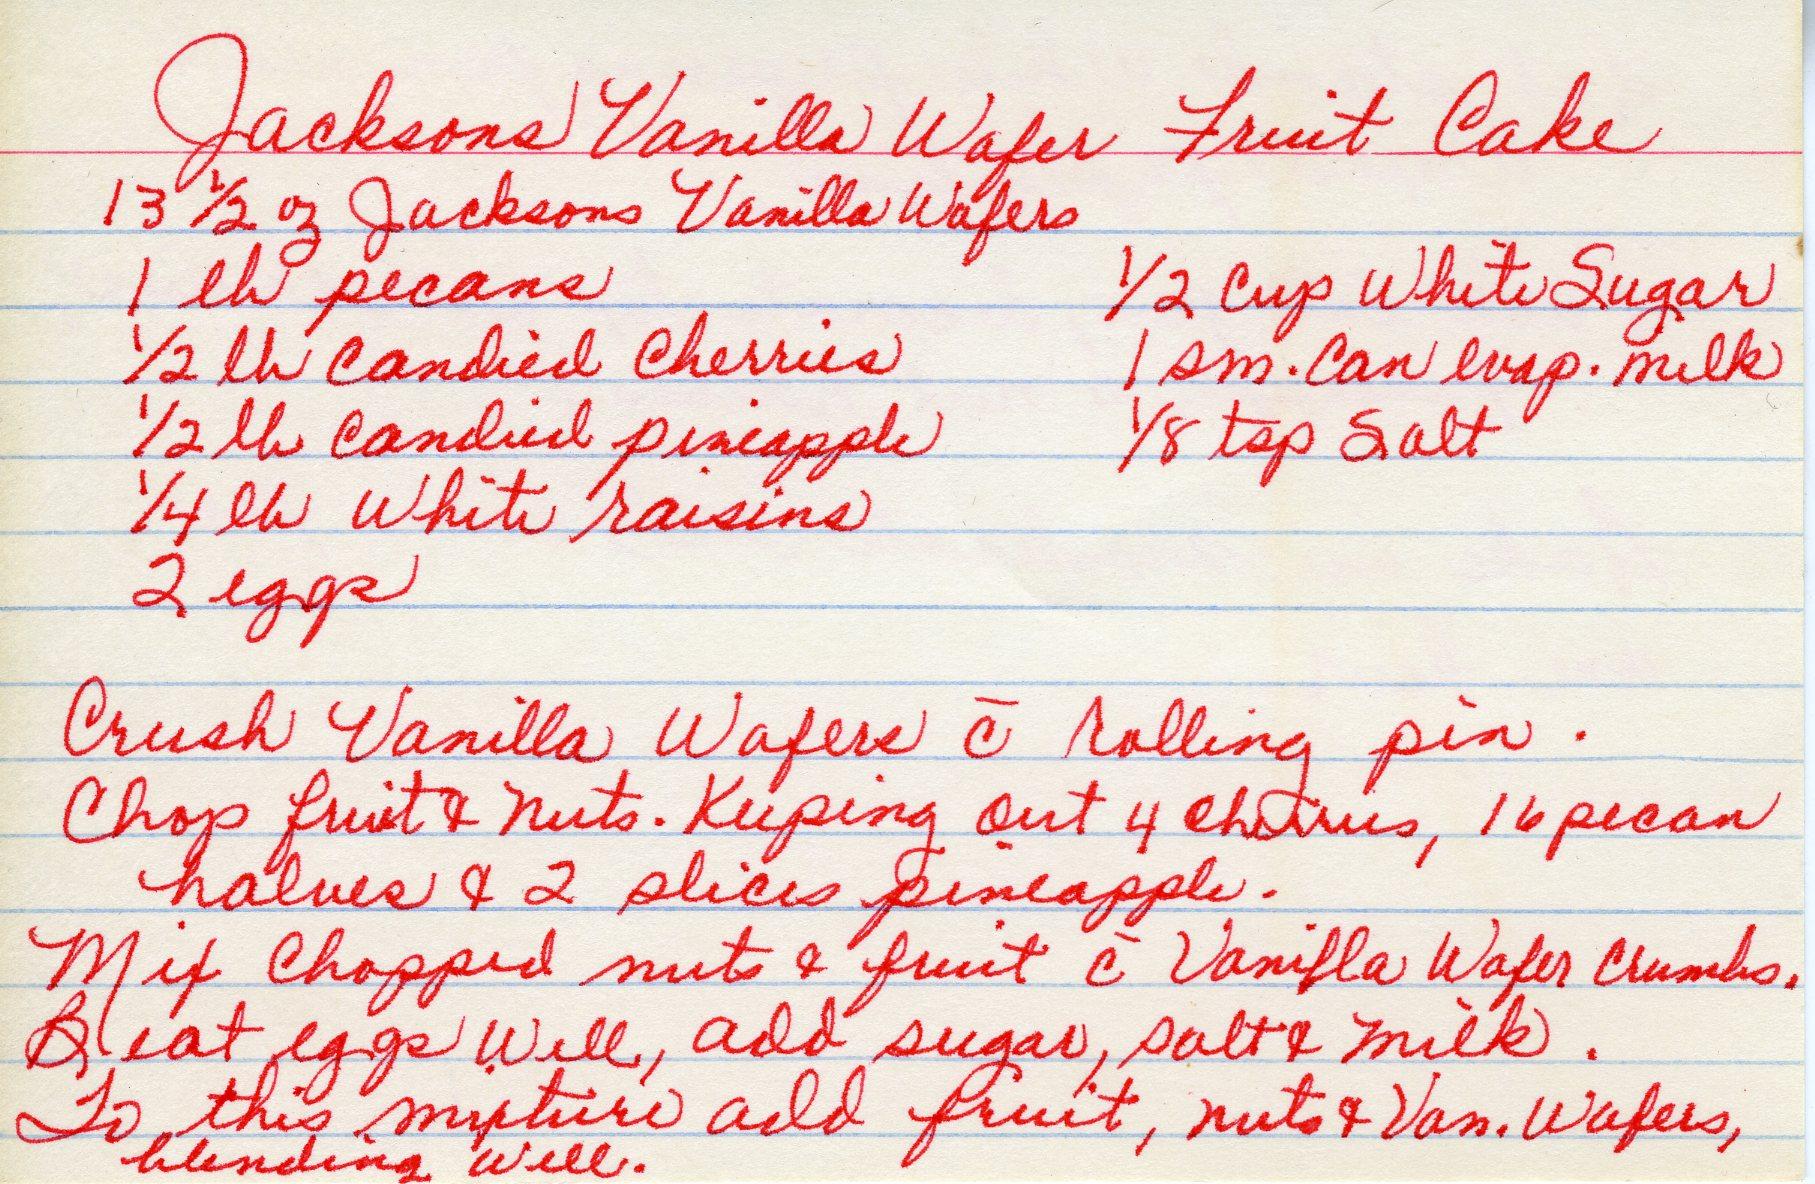 Jackson Vanilla Wafer Cake